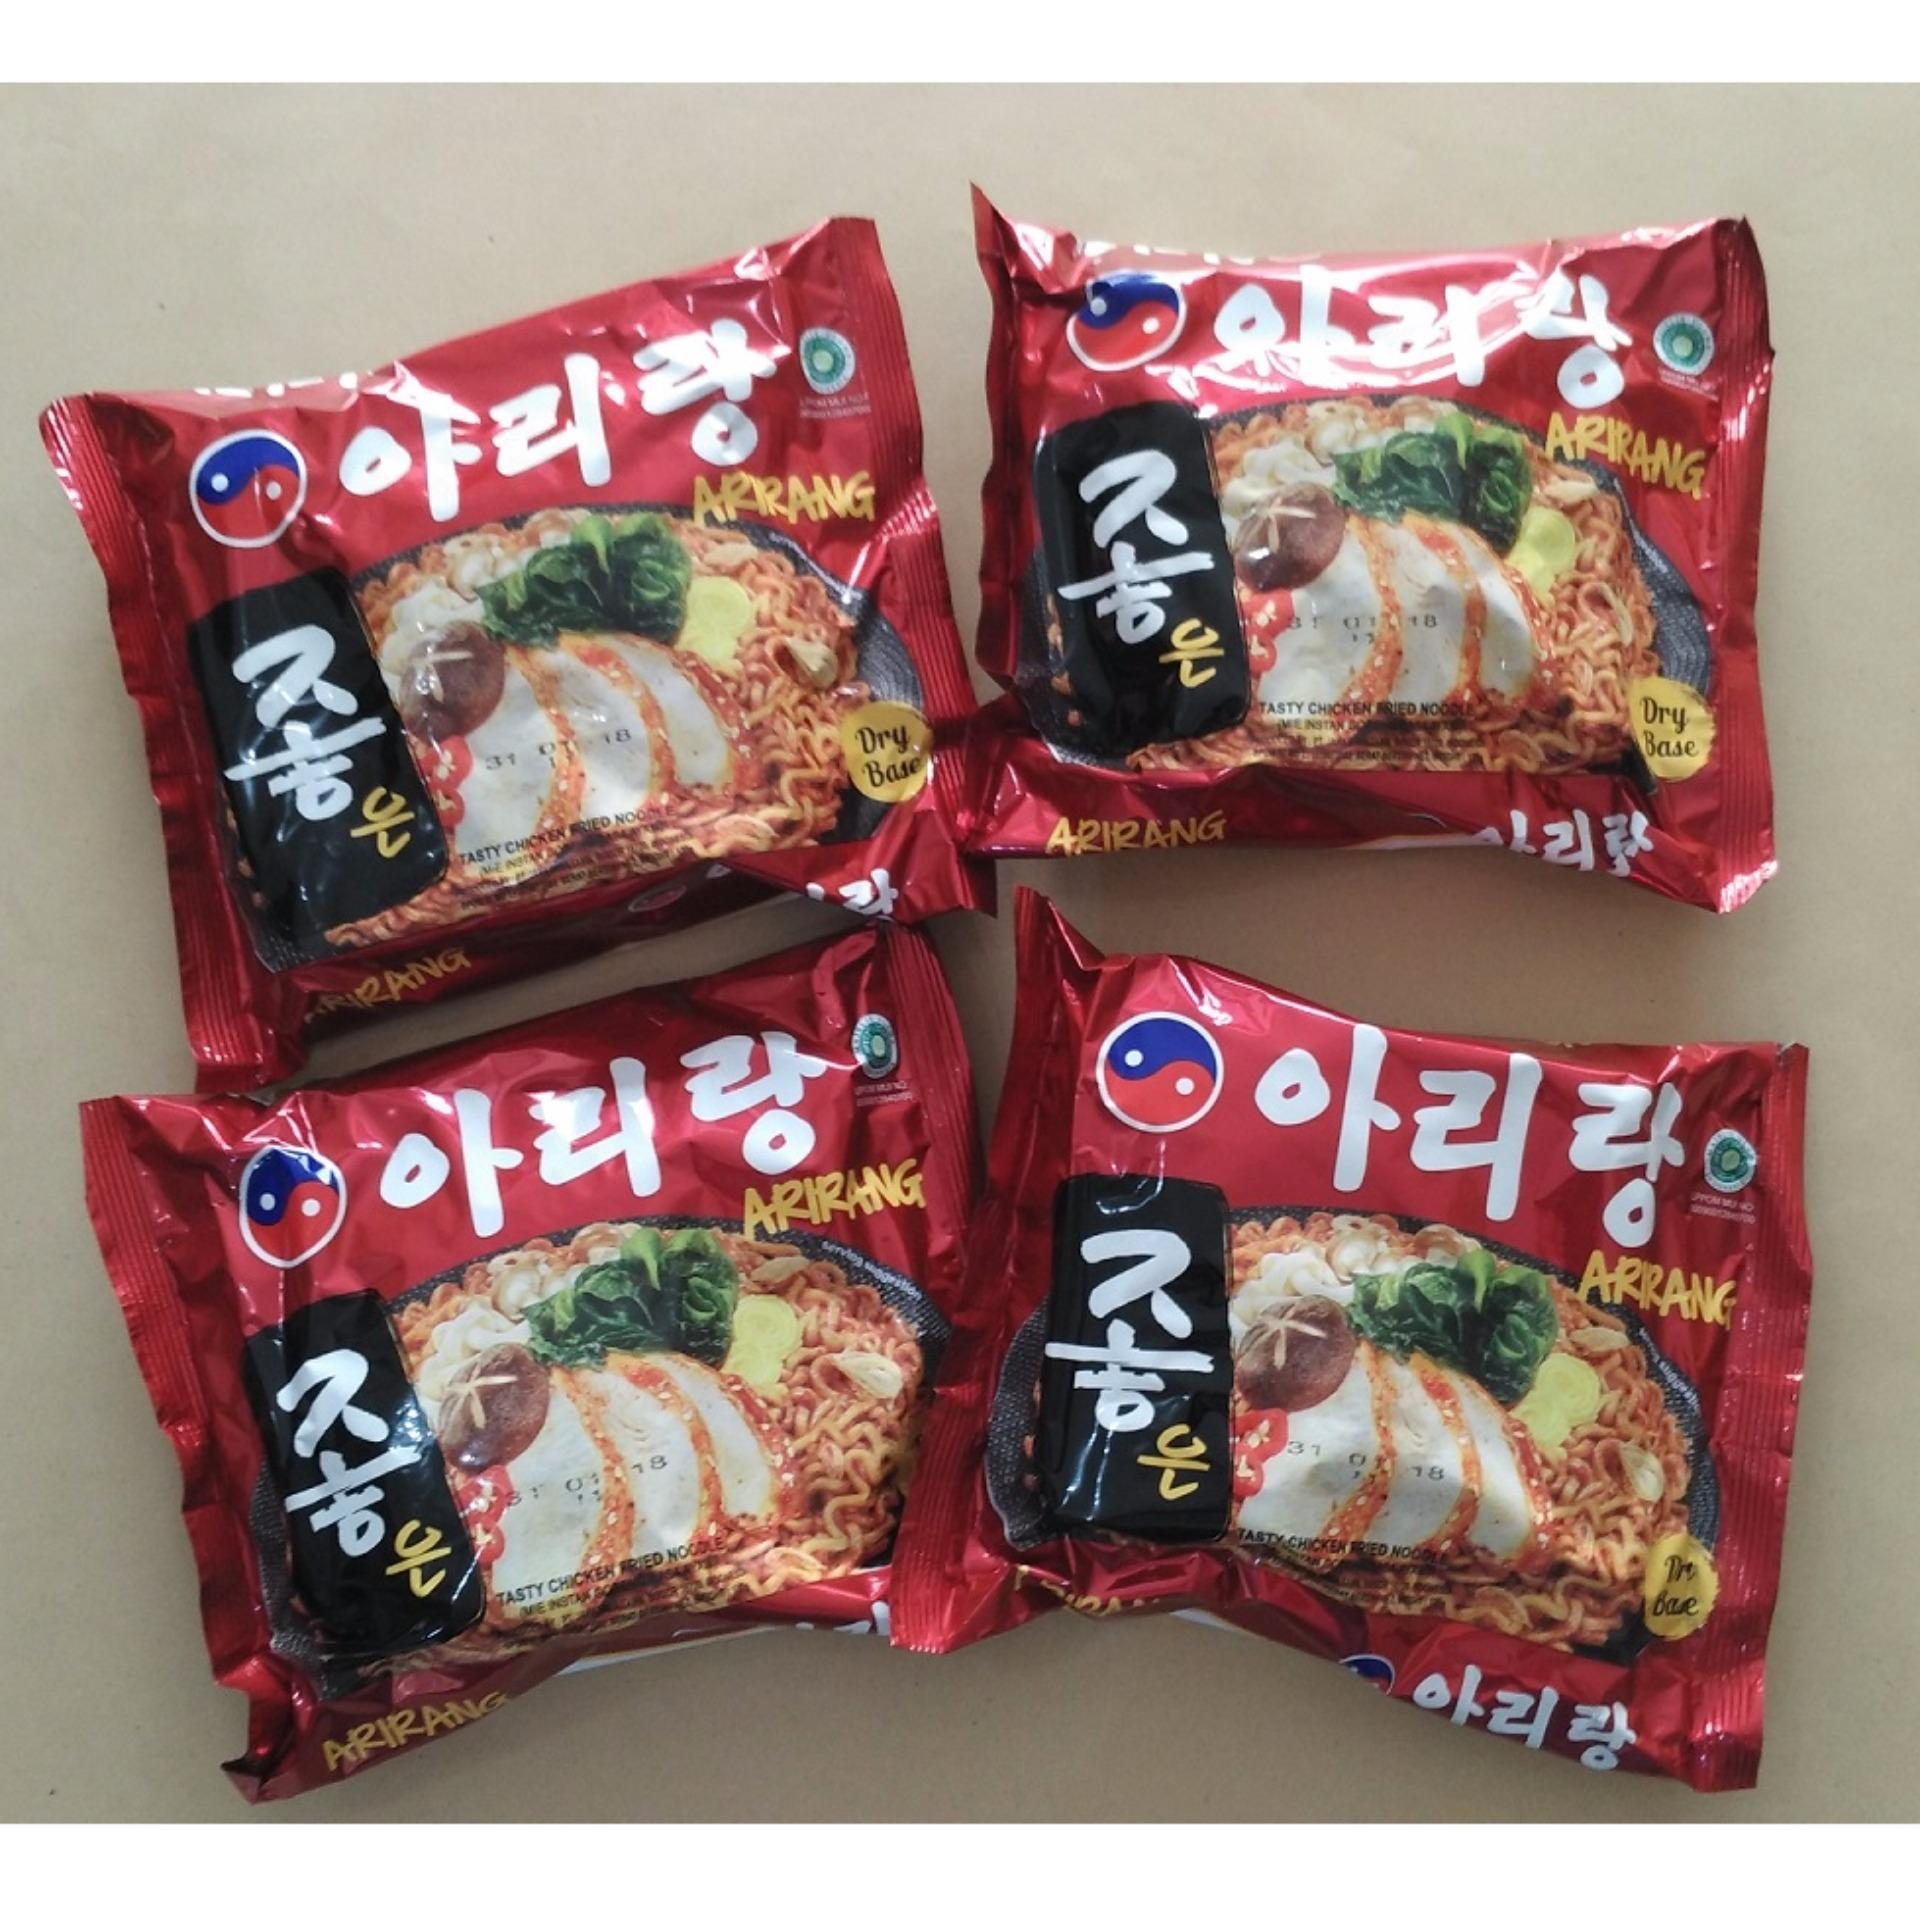 Penawaran Samyang Hot Chicken Ramen Spicy Mie Goreng Instant Dapat 3 Chese 140 Gr Arirang Mi Instan 4 Packs Korea Style Ayam Gurih 100 Halal Indonesia